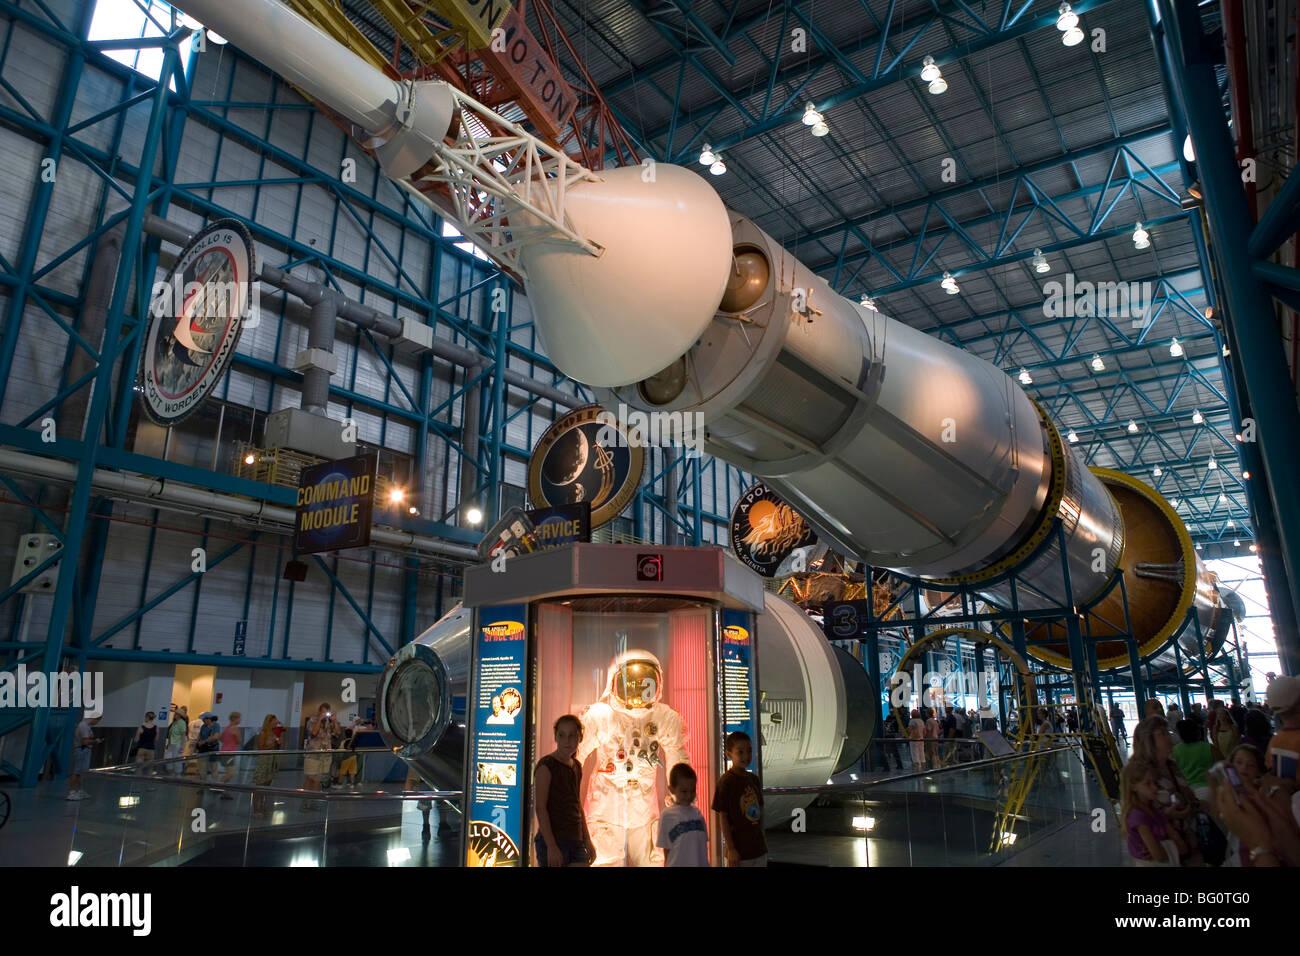 apollo 13 kennedy space center - photo #8